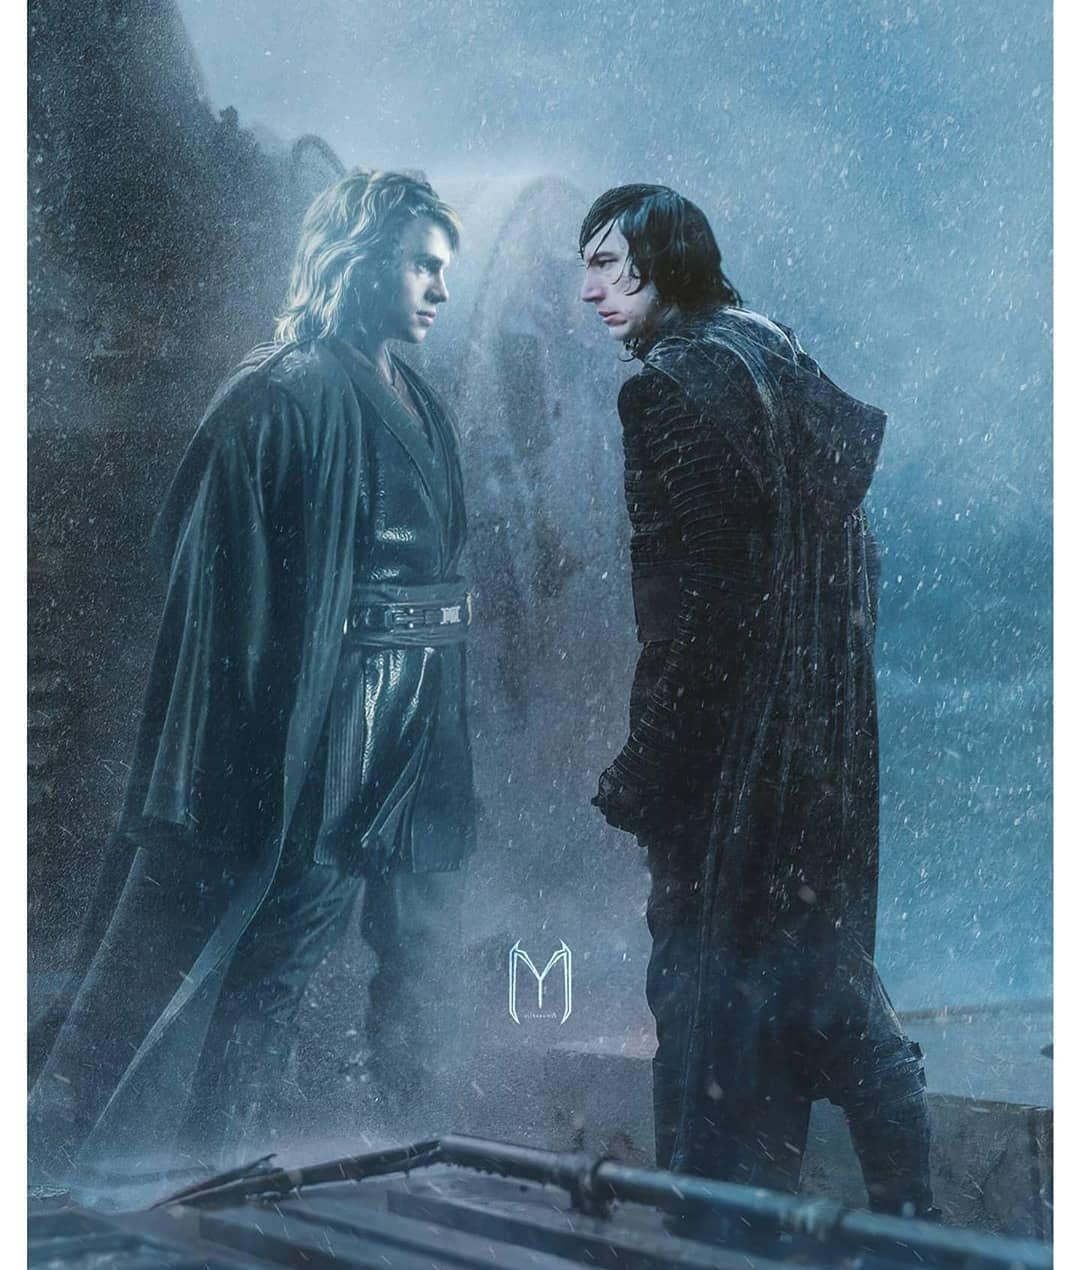 Pin By Jaide Beutler On Star Wars Sw In 2020 Star Wars Drawings Star Wars Ii Star Wars Fandom